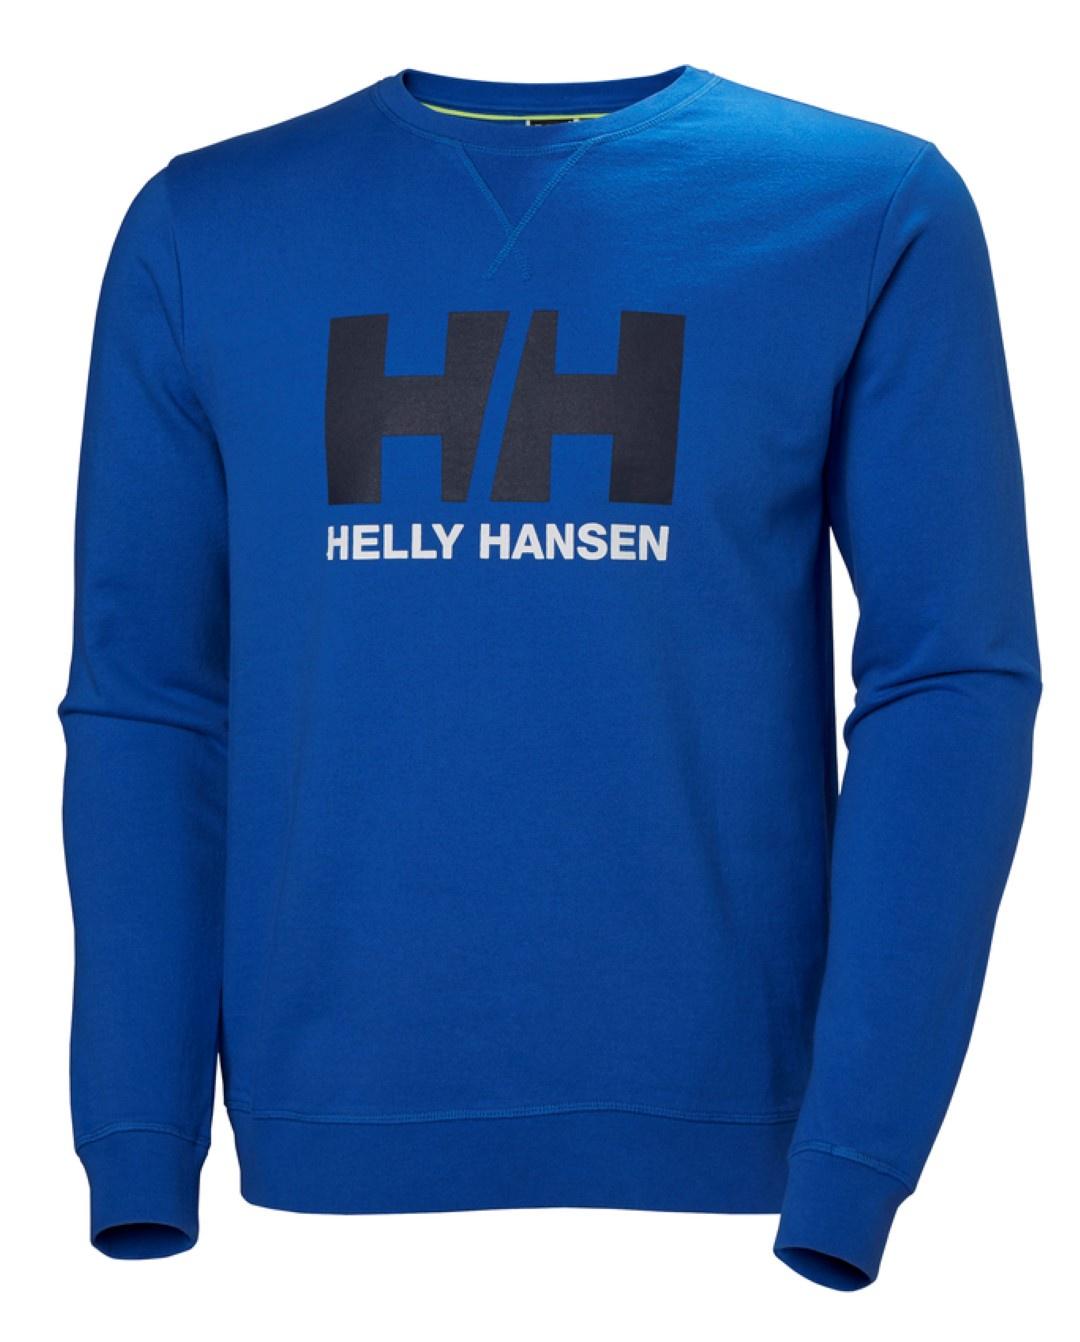 Жакет Helly Hansen брюки женские helly hansen w thalia pant цвет темно синий 53057 994 размер l 46